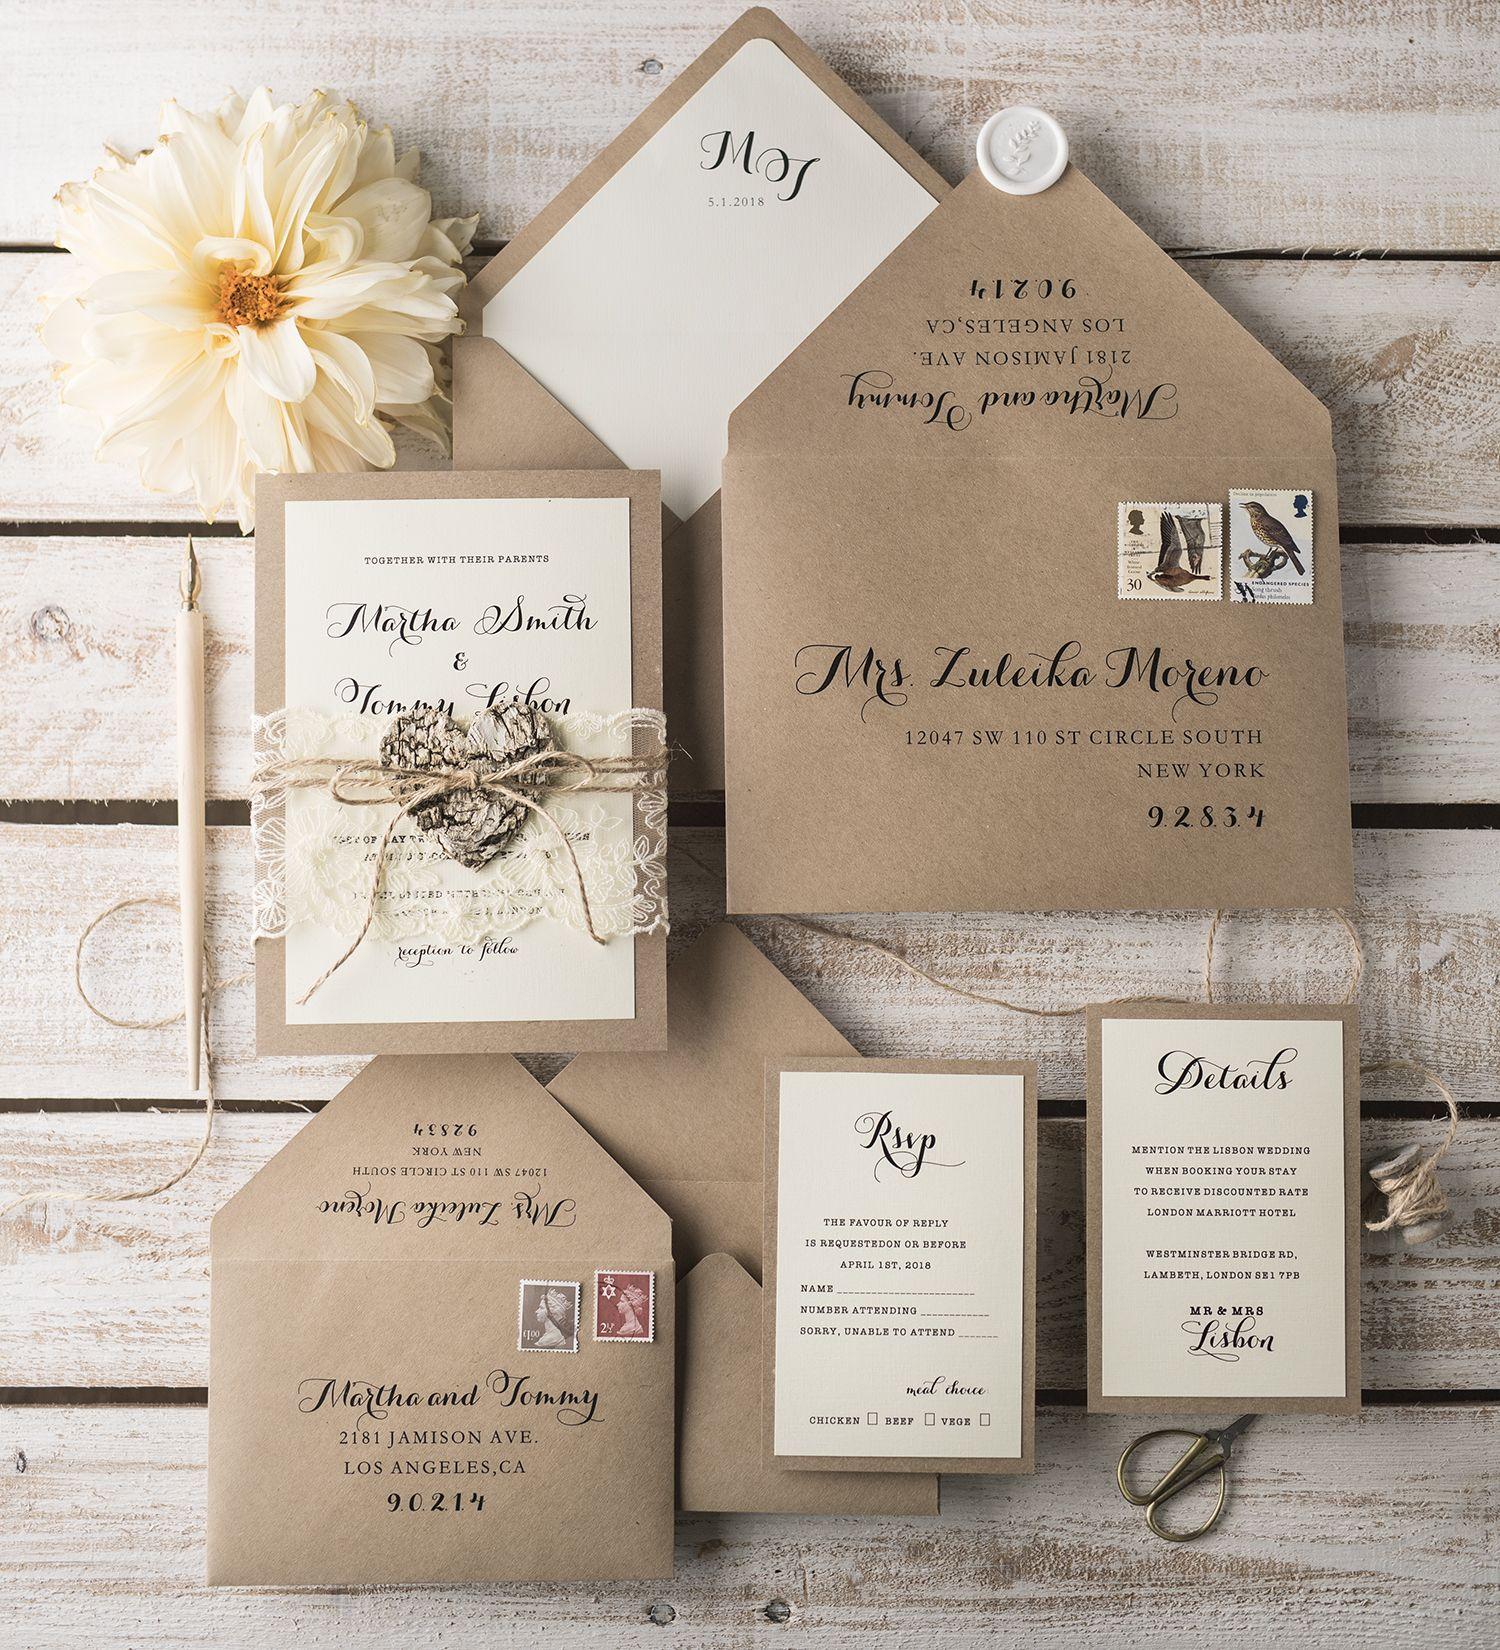 Cheap Rustic Wedding Invitations: Wedding Invitations Personalised Cheap 02/rus1/z In 2019